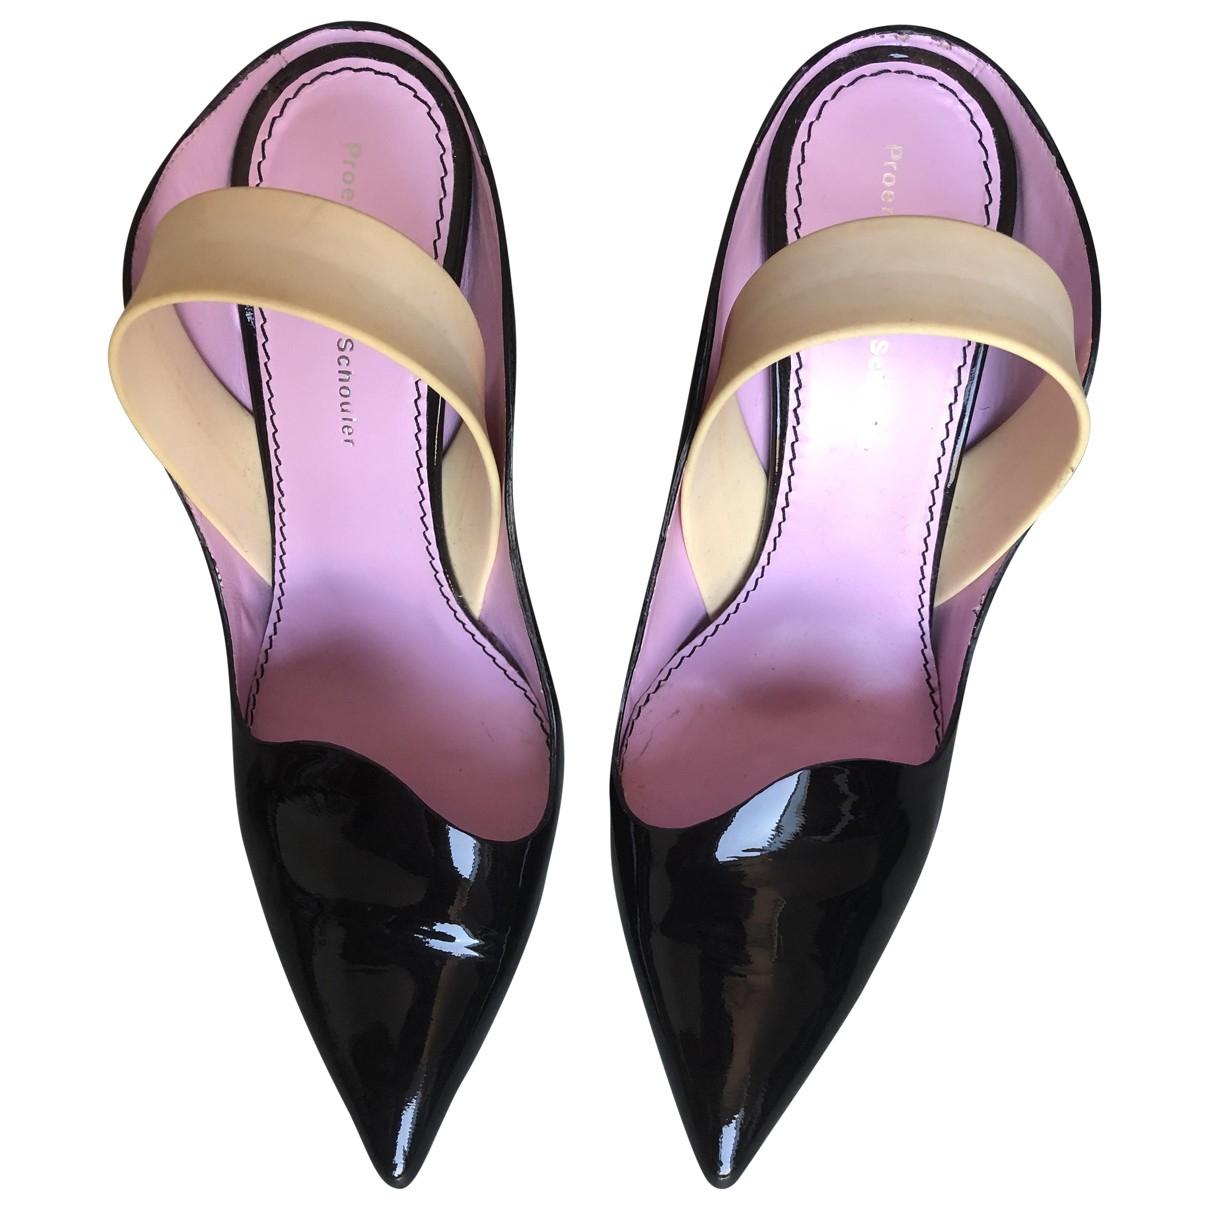 Proenza Schouler \N Black Patent leather Heels for Women 37.5 EU